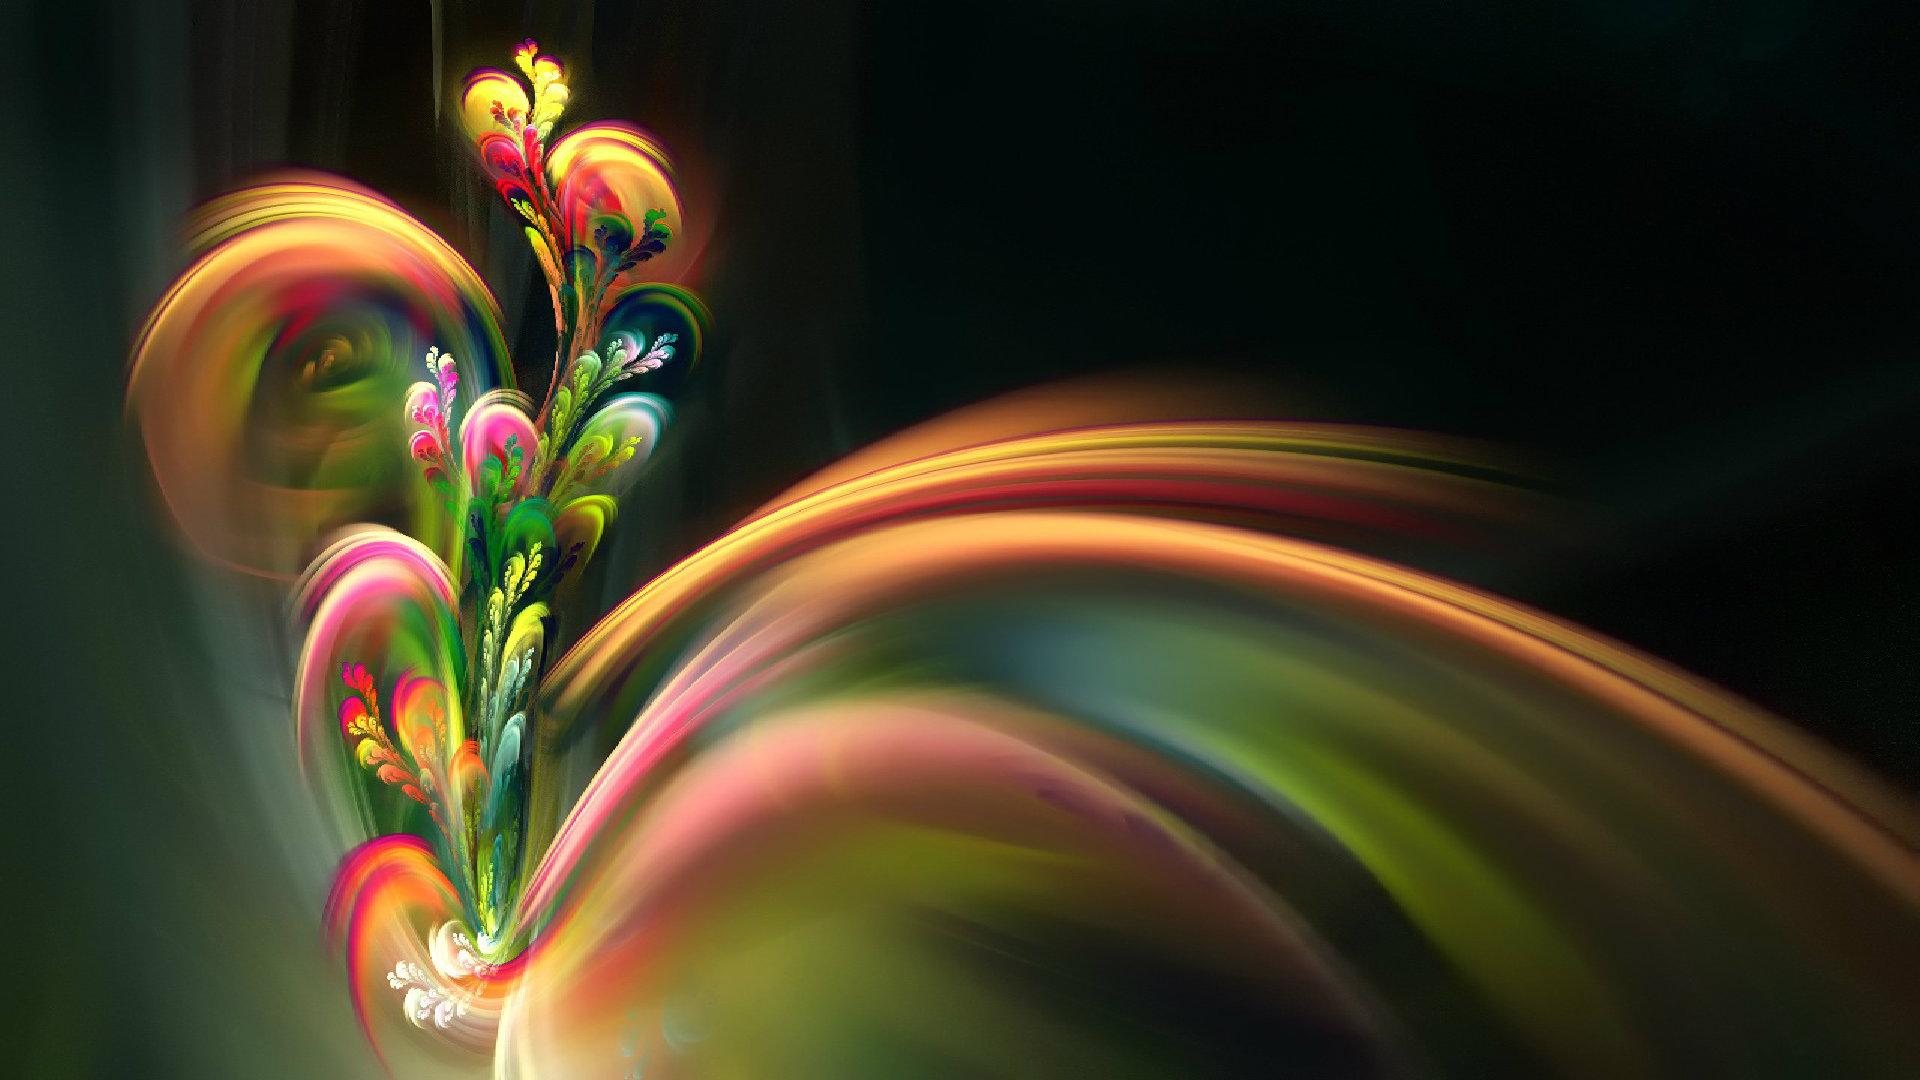 1000+ images about DREAMY ✿⊱╮DESKTOP on Pinterest | Flower